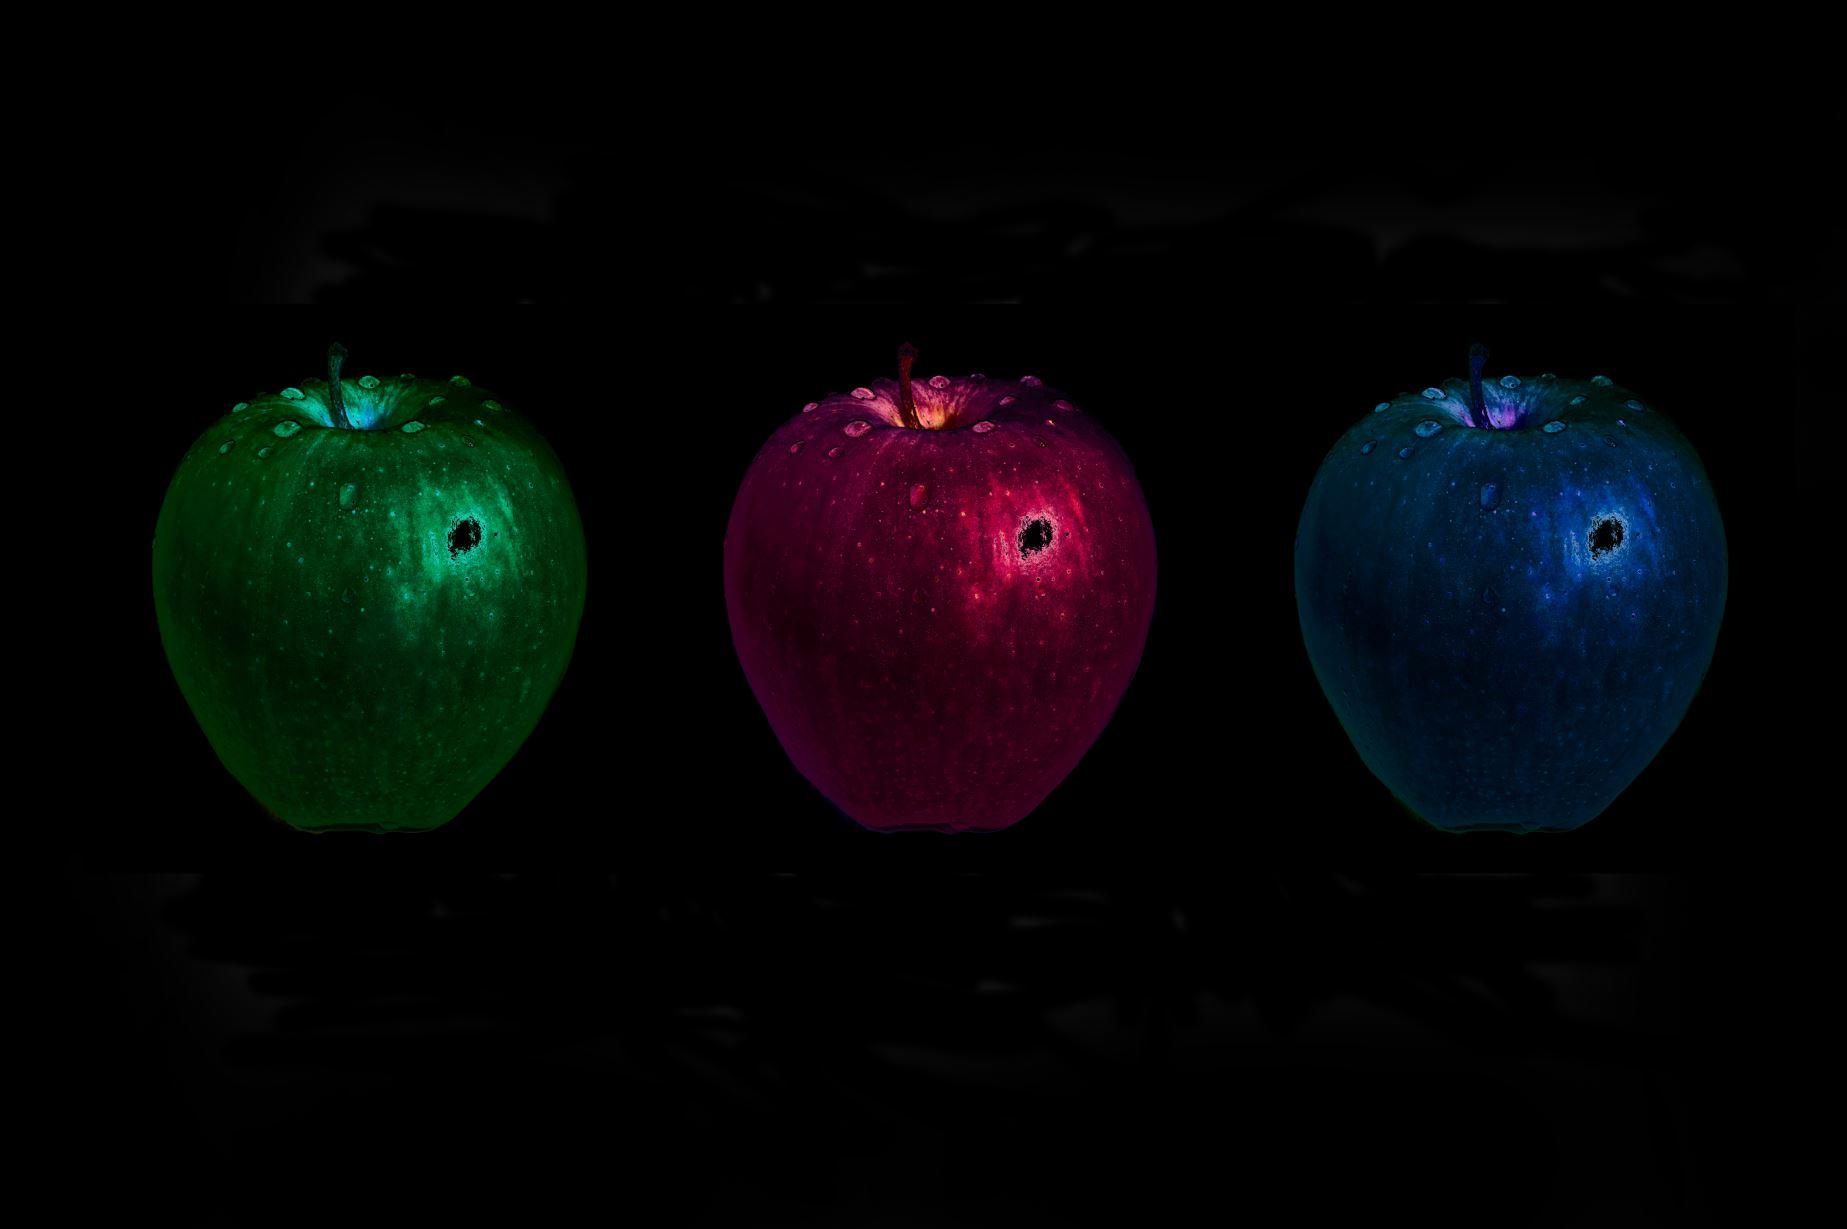 Glowing Apples (CBF010)